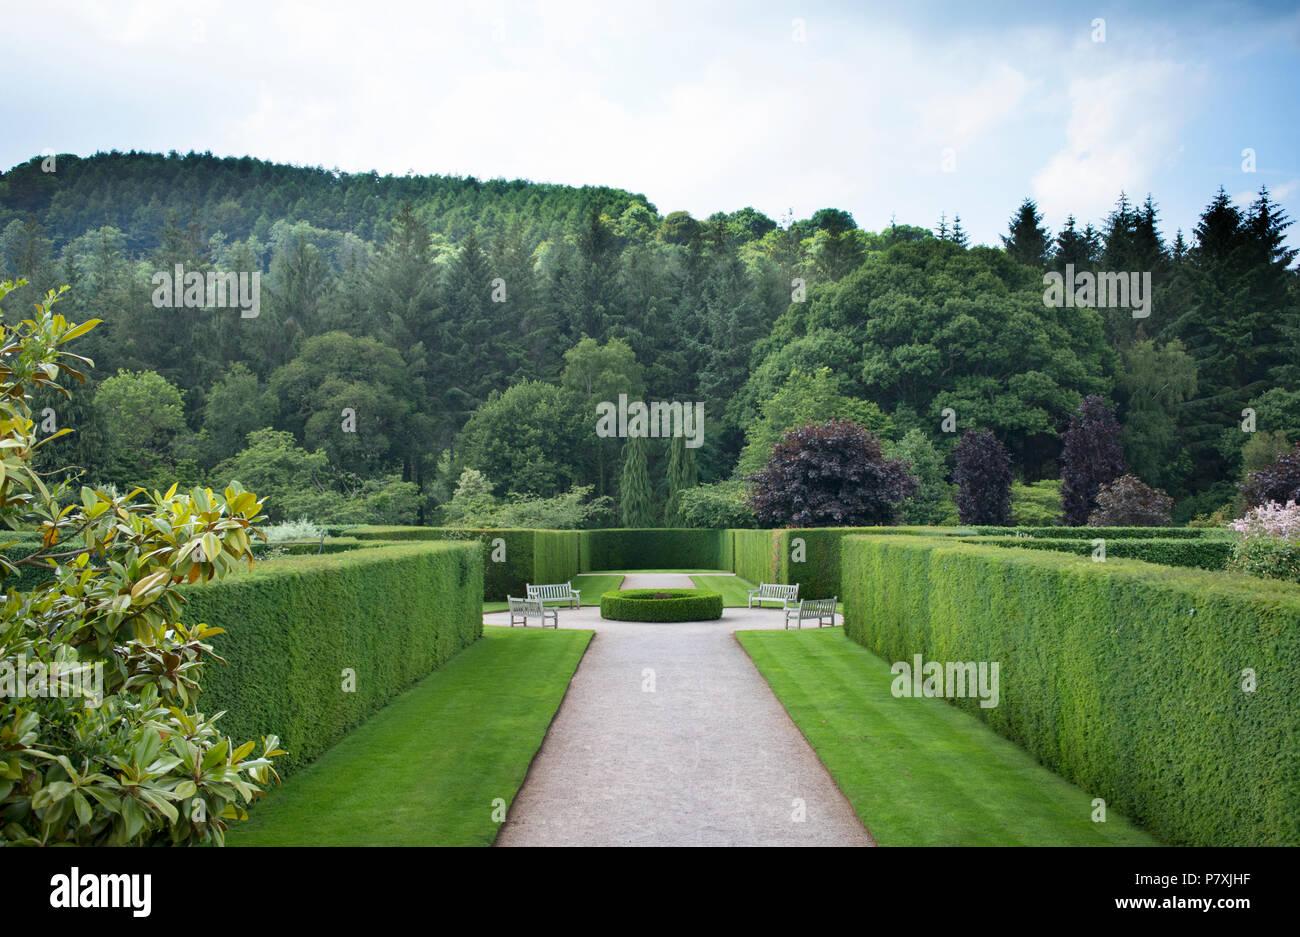 An avenue of yew hedging at RHS Rosemoor Gardens, Torrington, UK - Stock Image